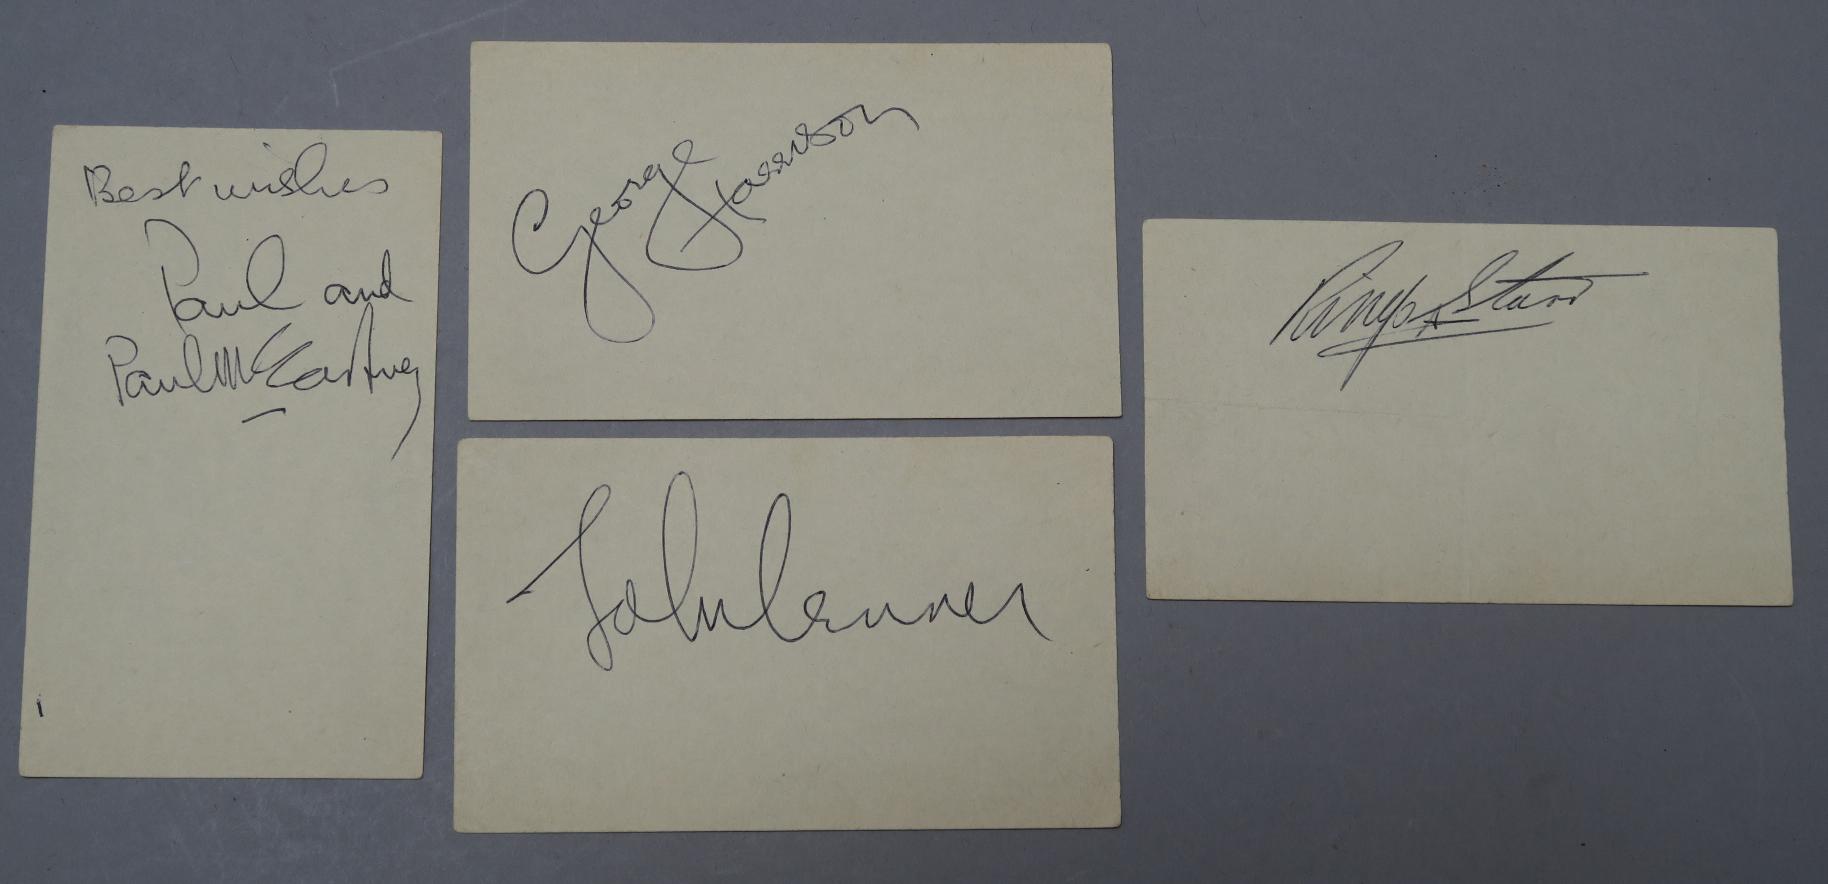 Lot 7 - The Beatles autographs - Paul McCartney, John Lennon,